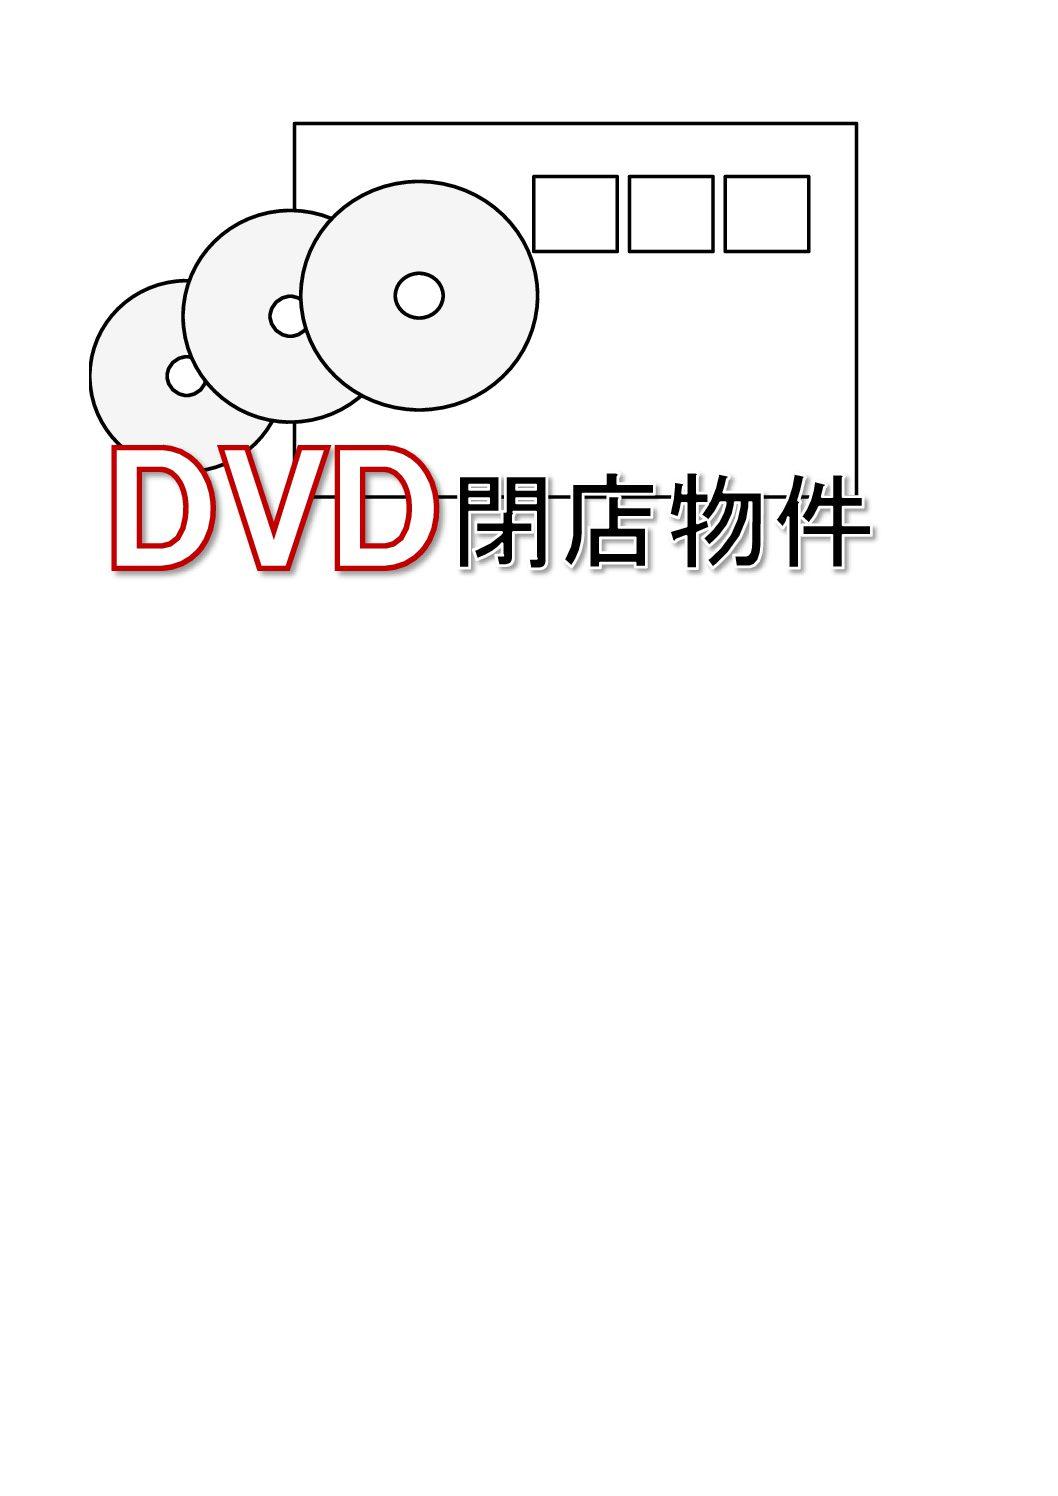 【NEW】閉店物件 レンタル用 中古DVD 一般作【a-28-10-1】